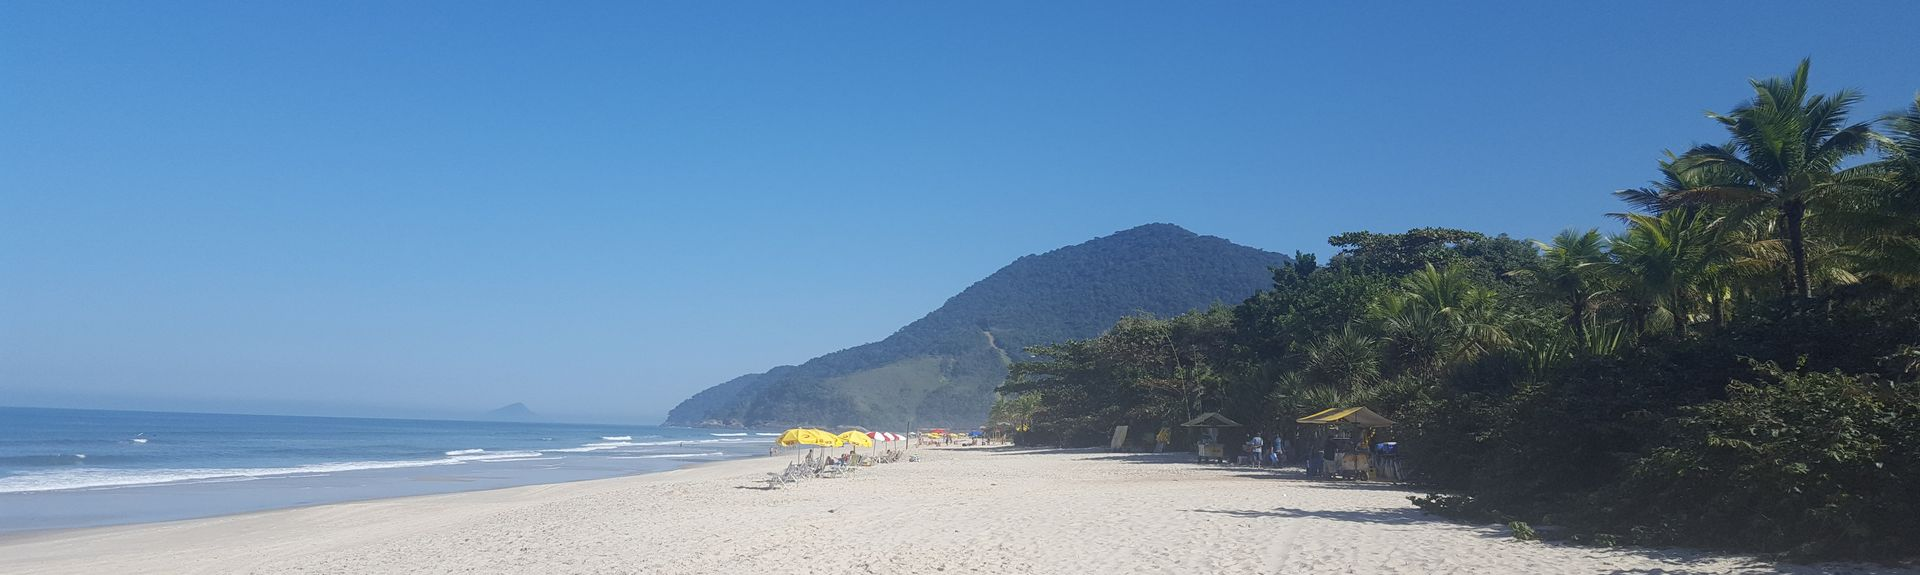 Praia do Jabaquara, Ilhabela, Regio zuidoost, Brazilië